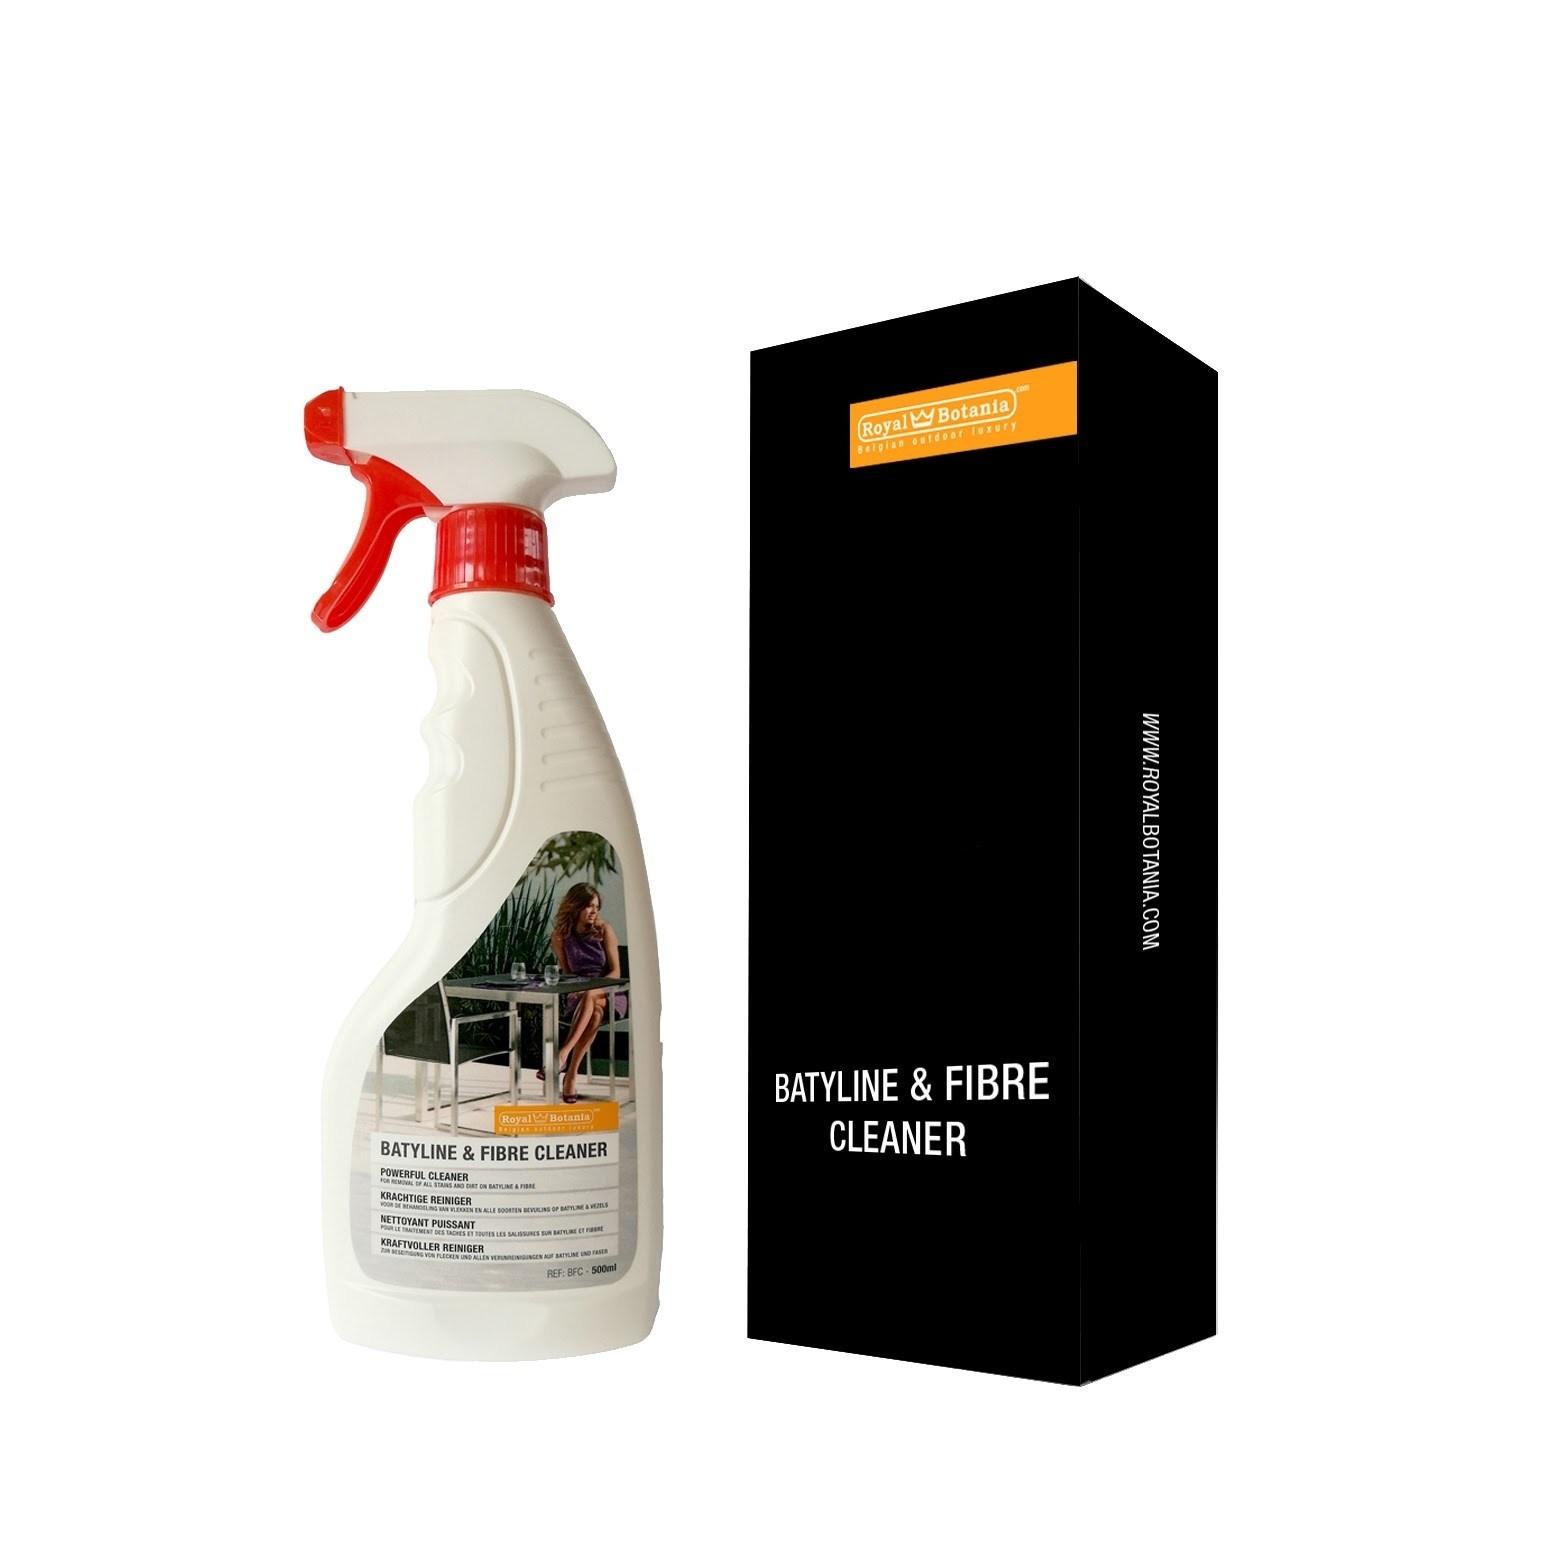 Batyline & Fibre Cleaner - 500ml